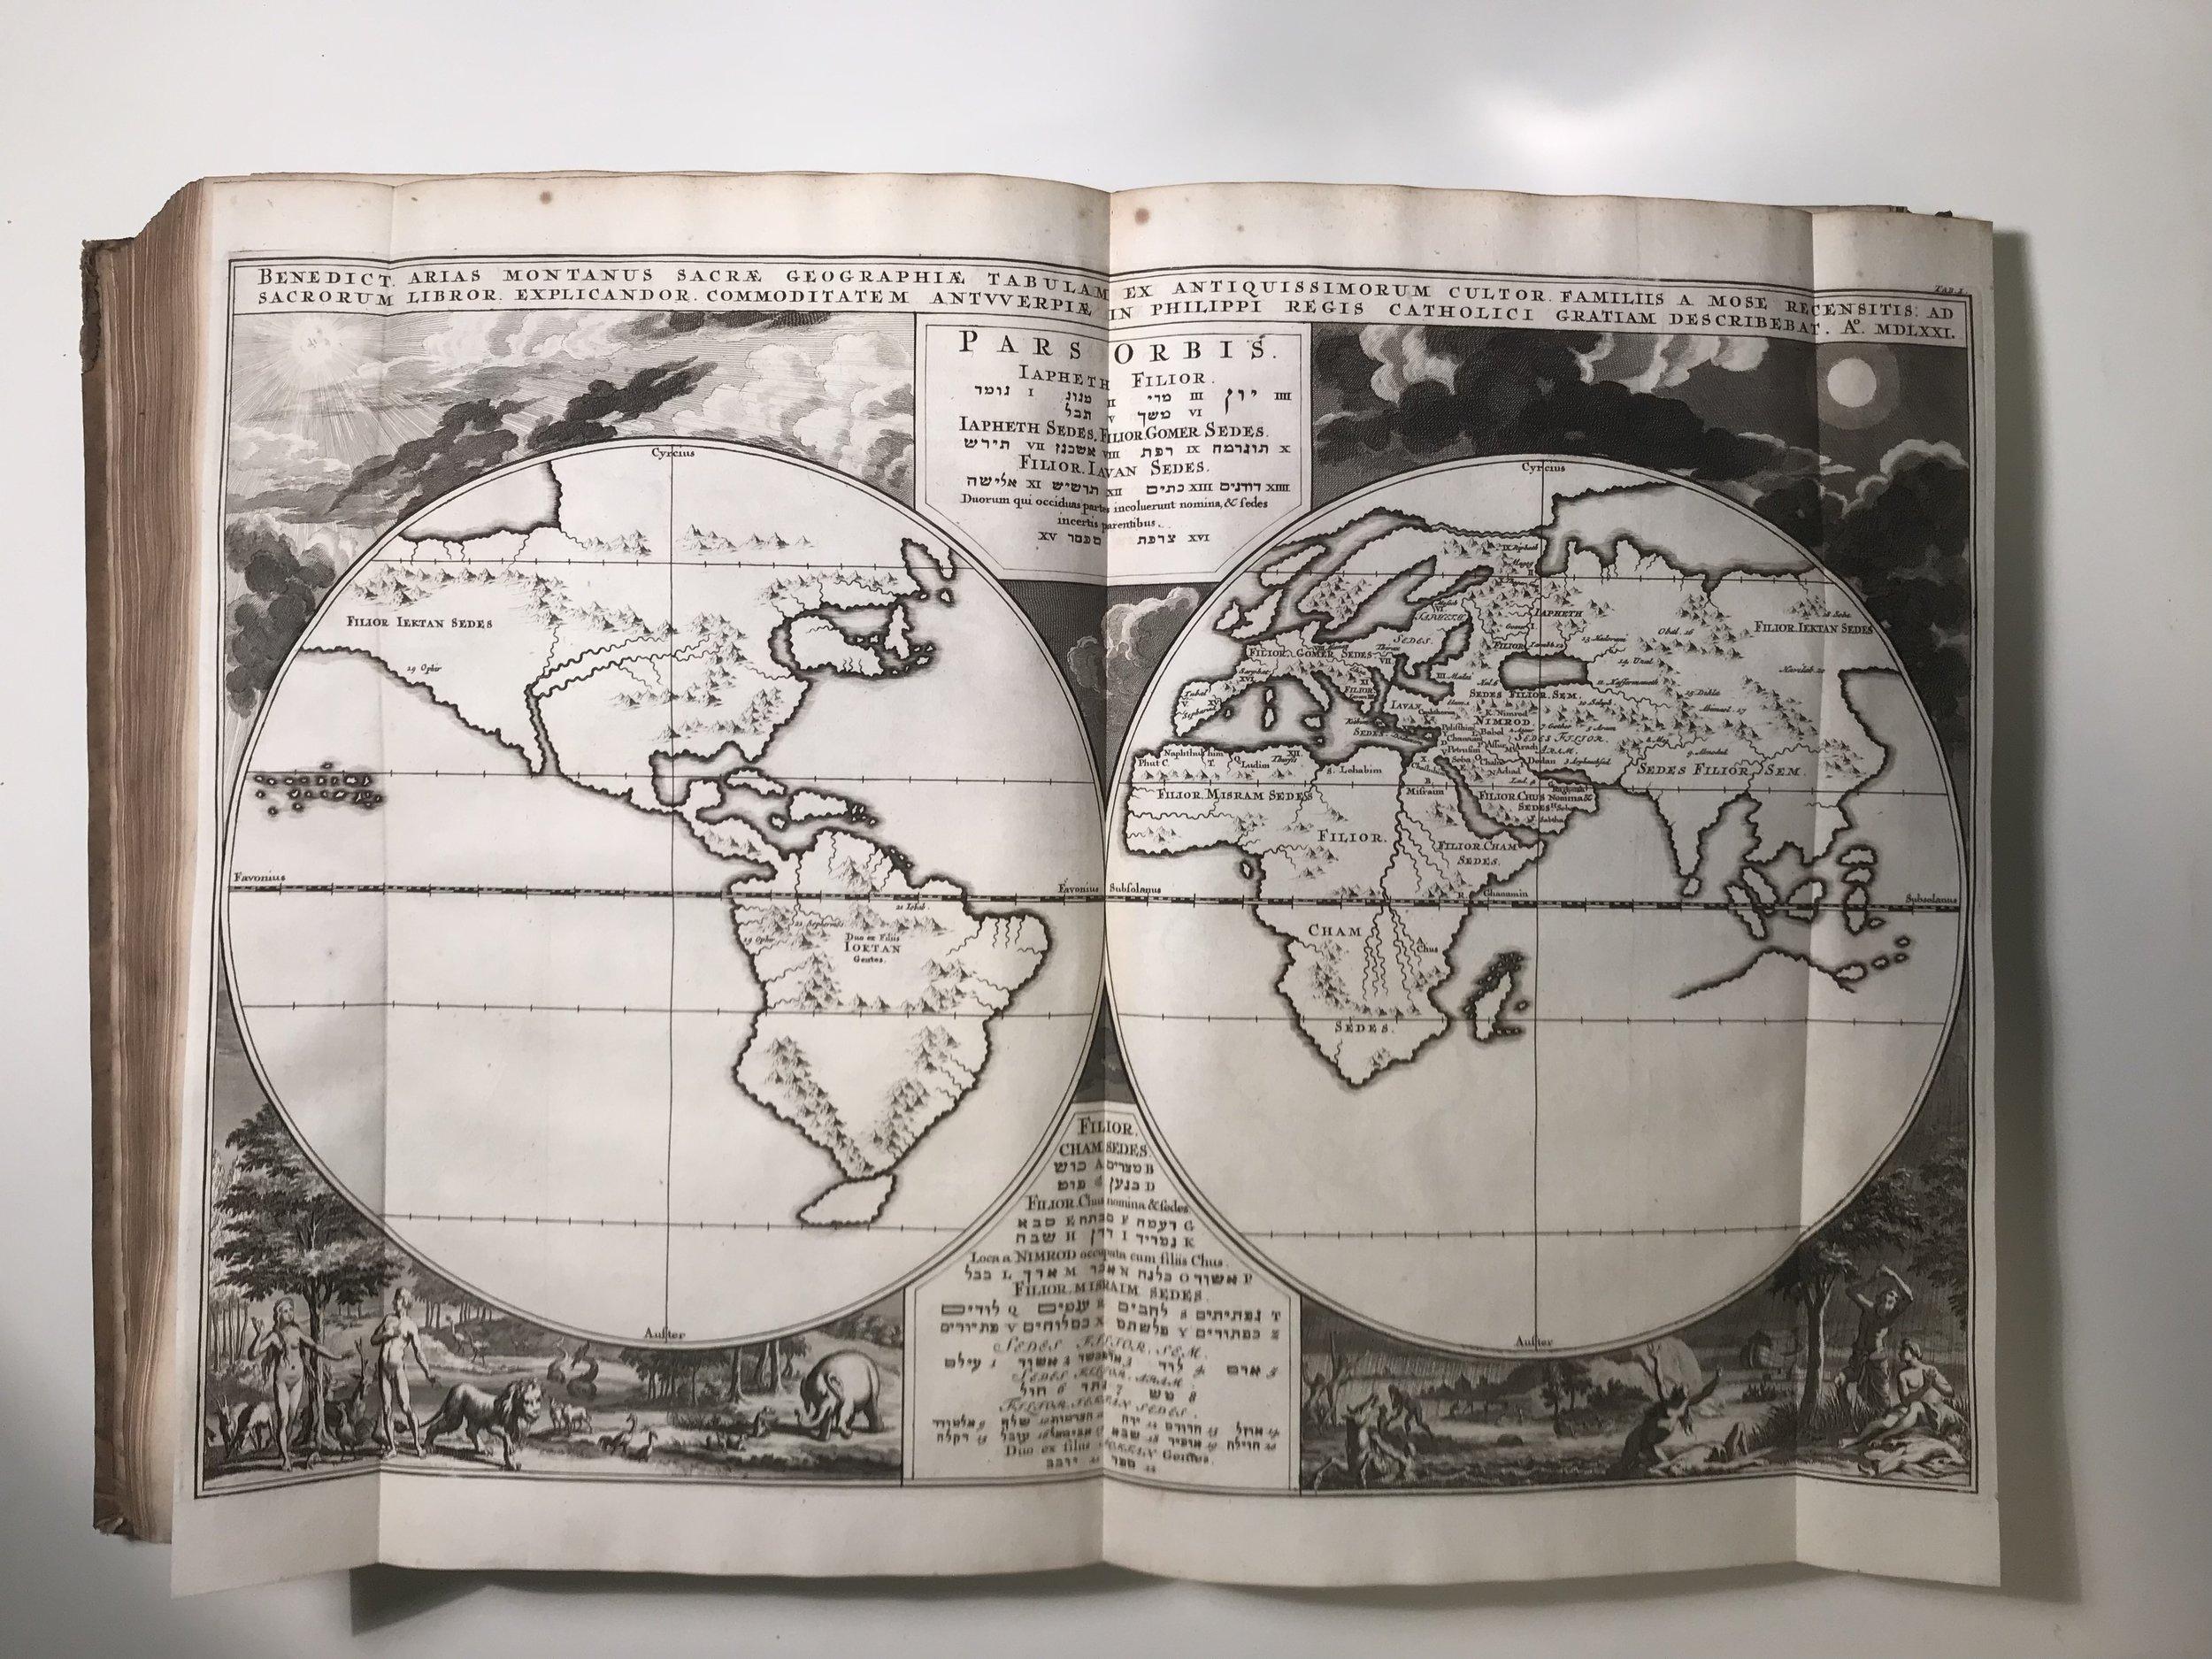 17th Century World Map showing North Coast of Australia